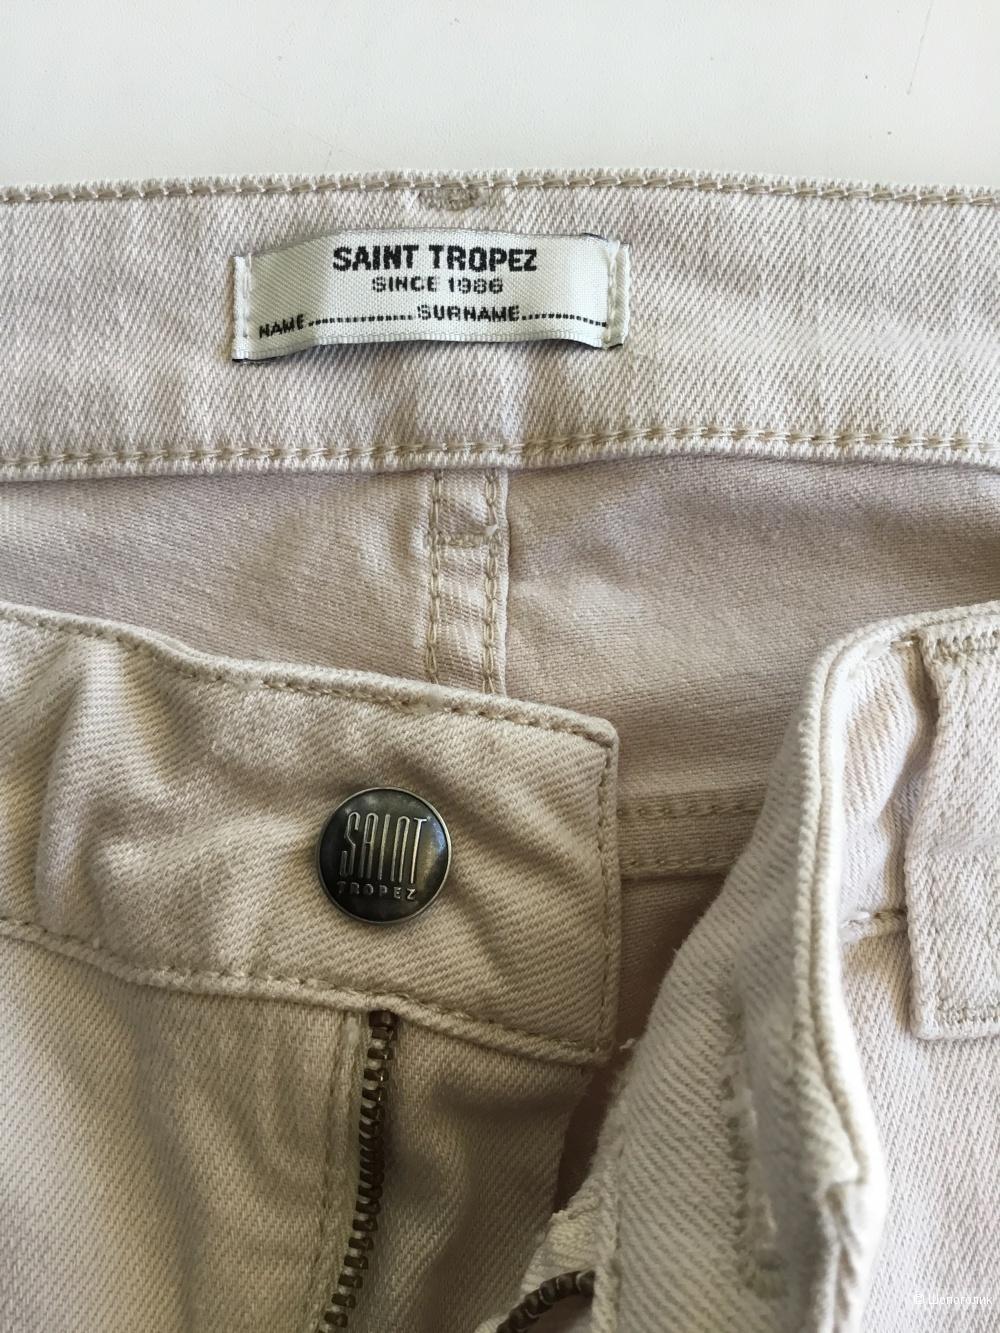 Джинсы Saint Tropez 46 размер